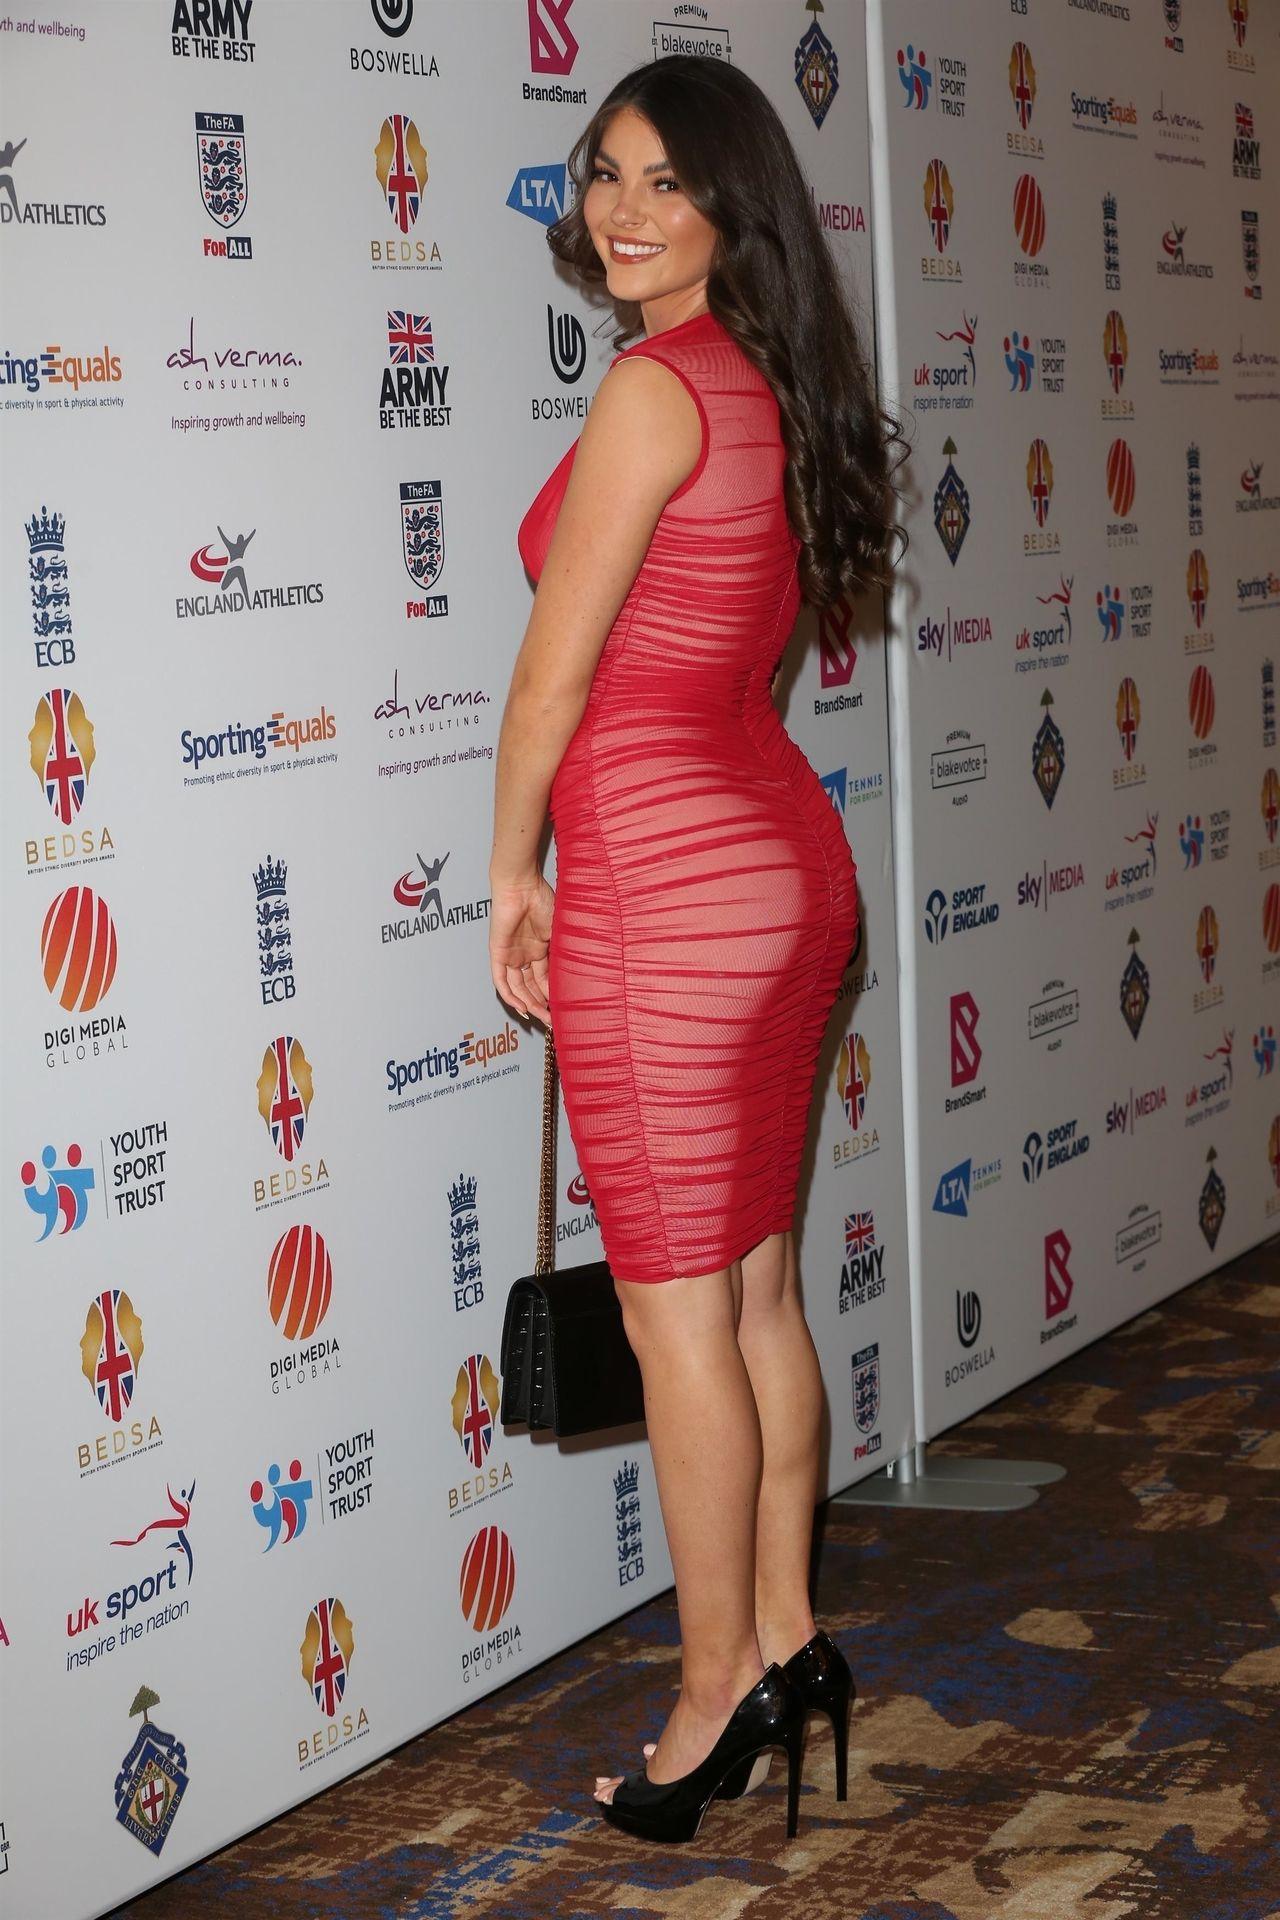 Rebecca Gormley & Biggs Chris Attend British Ethnic Diversity Sports Awards 0056